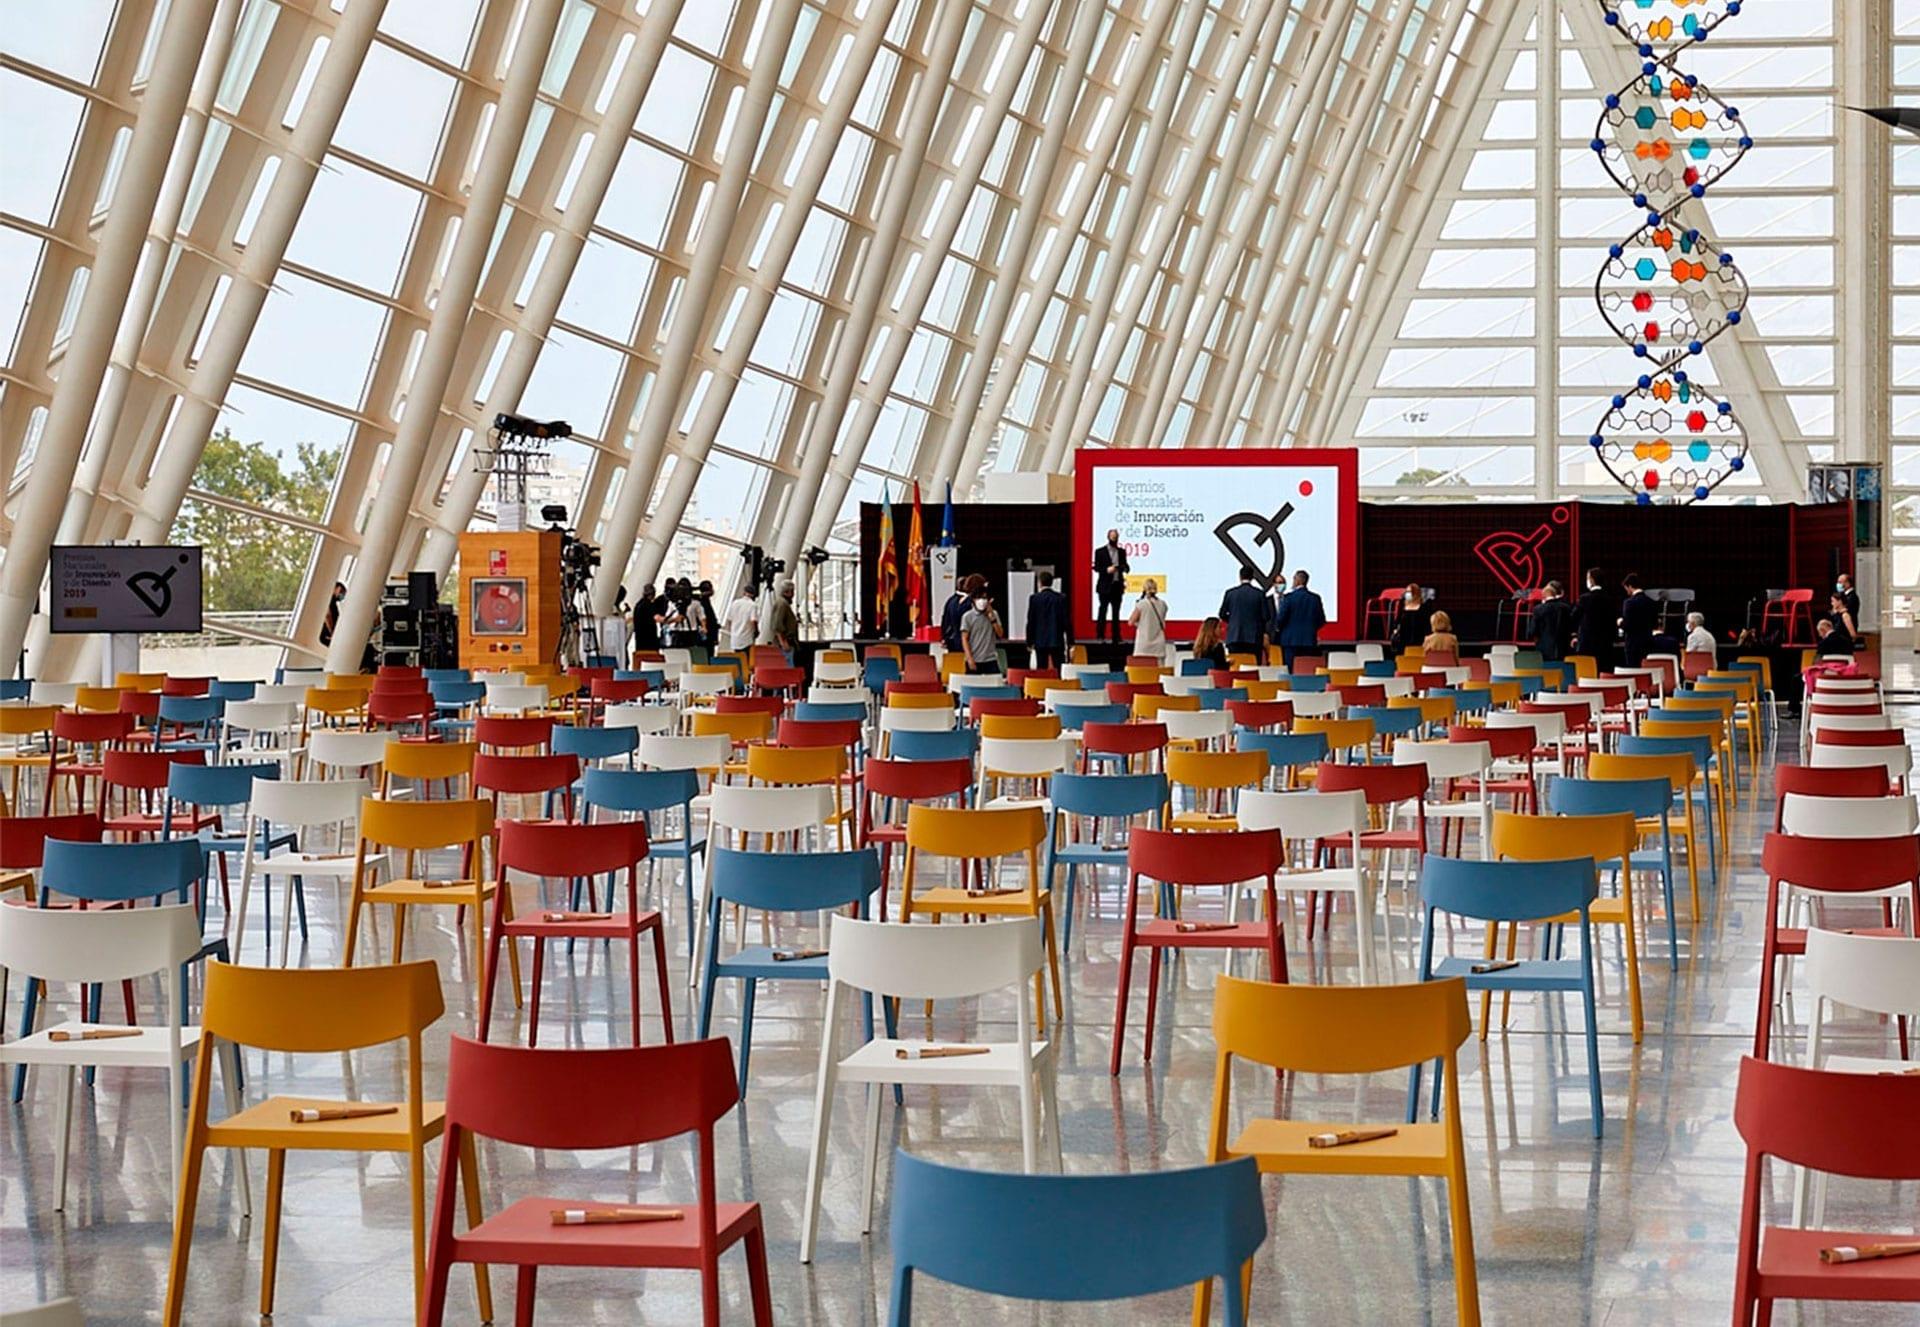 Valencia hosts the National Innovation and Design Awards 2019